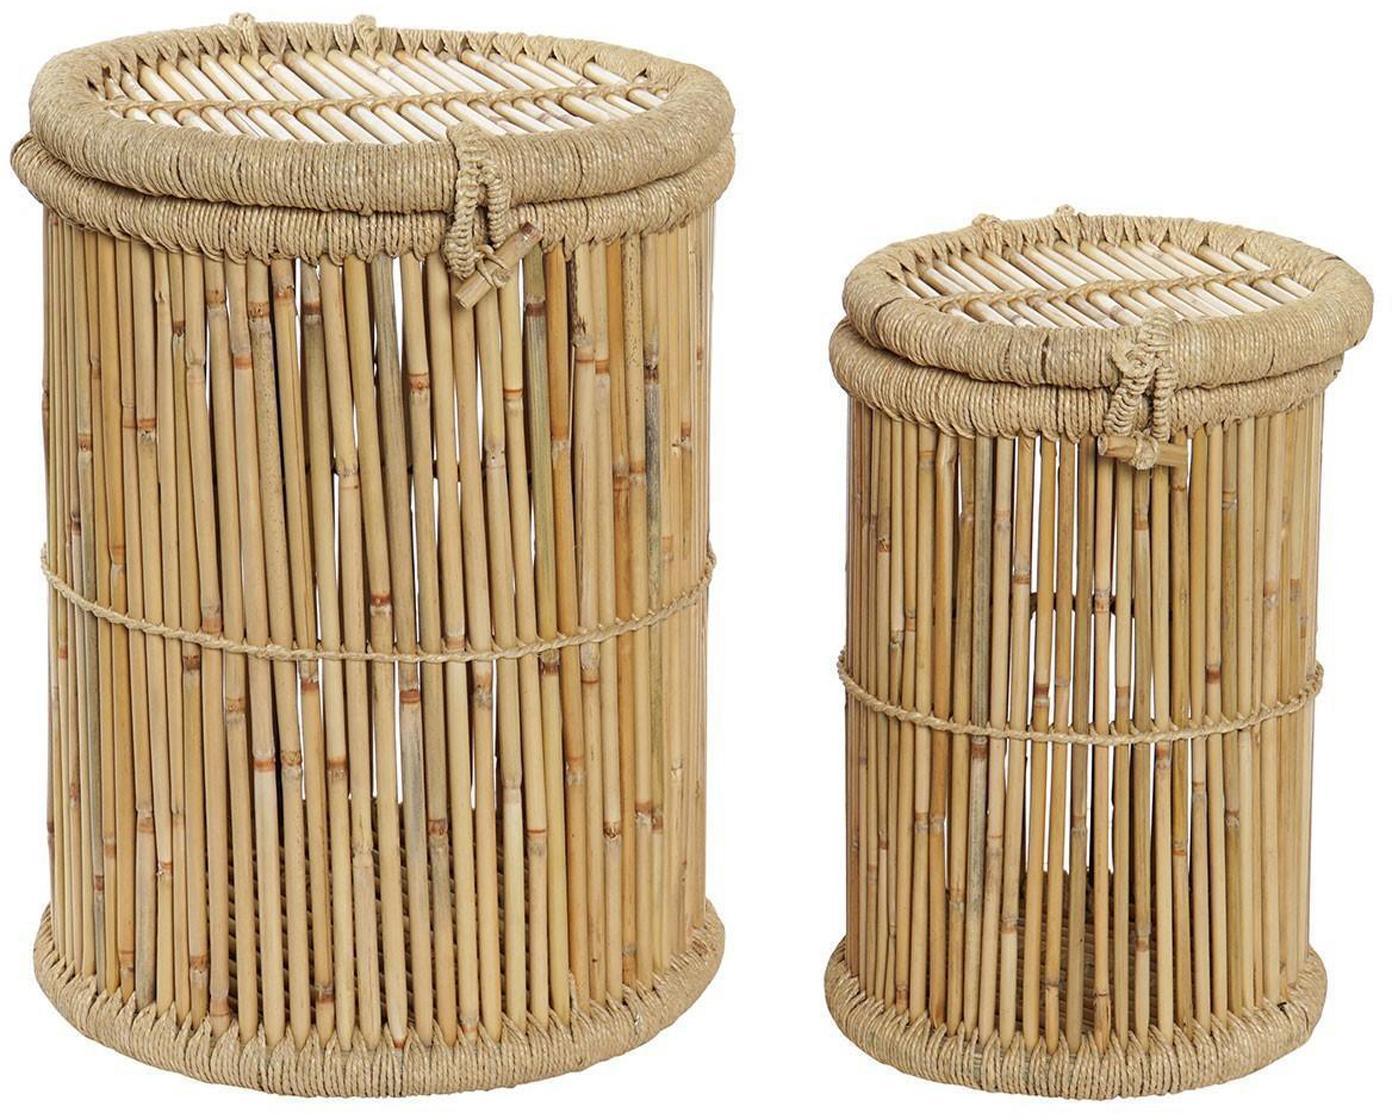 Set de cestas Jambu, 2pzas., Cesta: Bambú, Beige, Set de diferentes tamaños